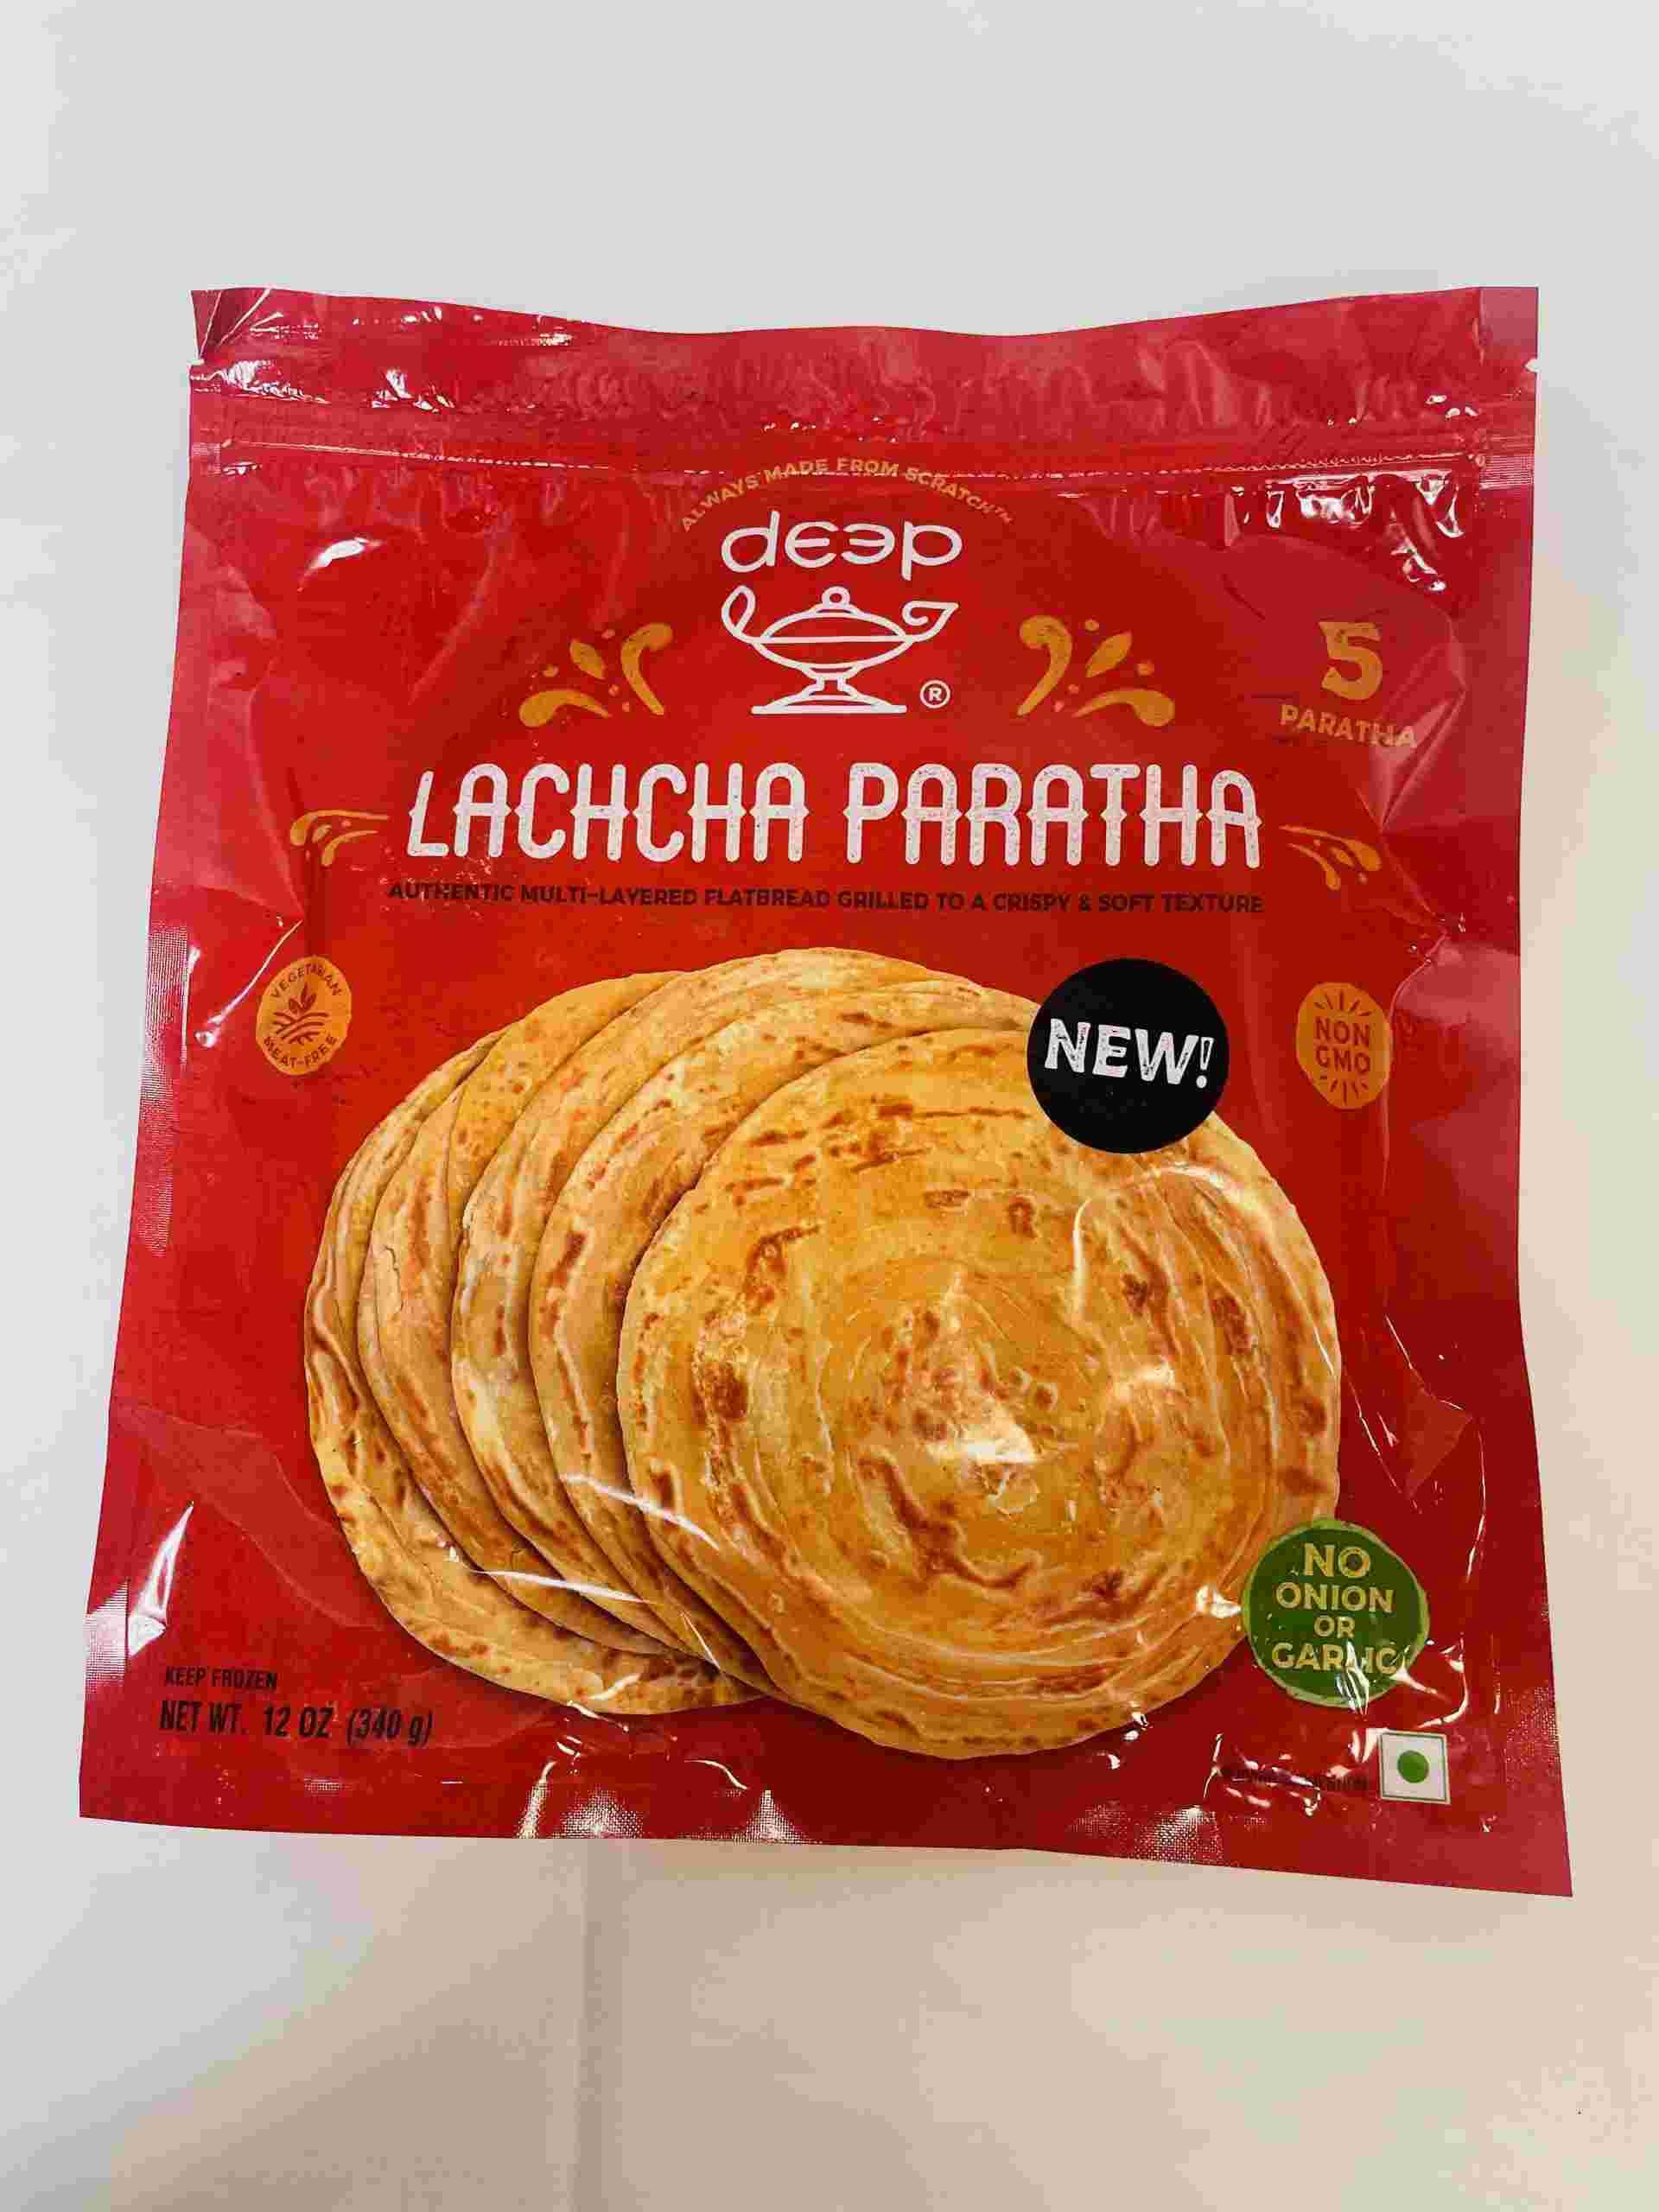 Deep  Lachcha Paratha 5 Pieces